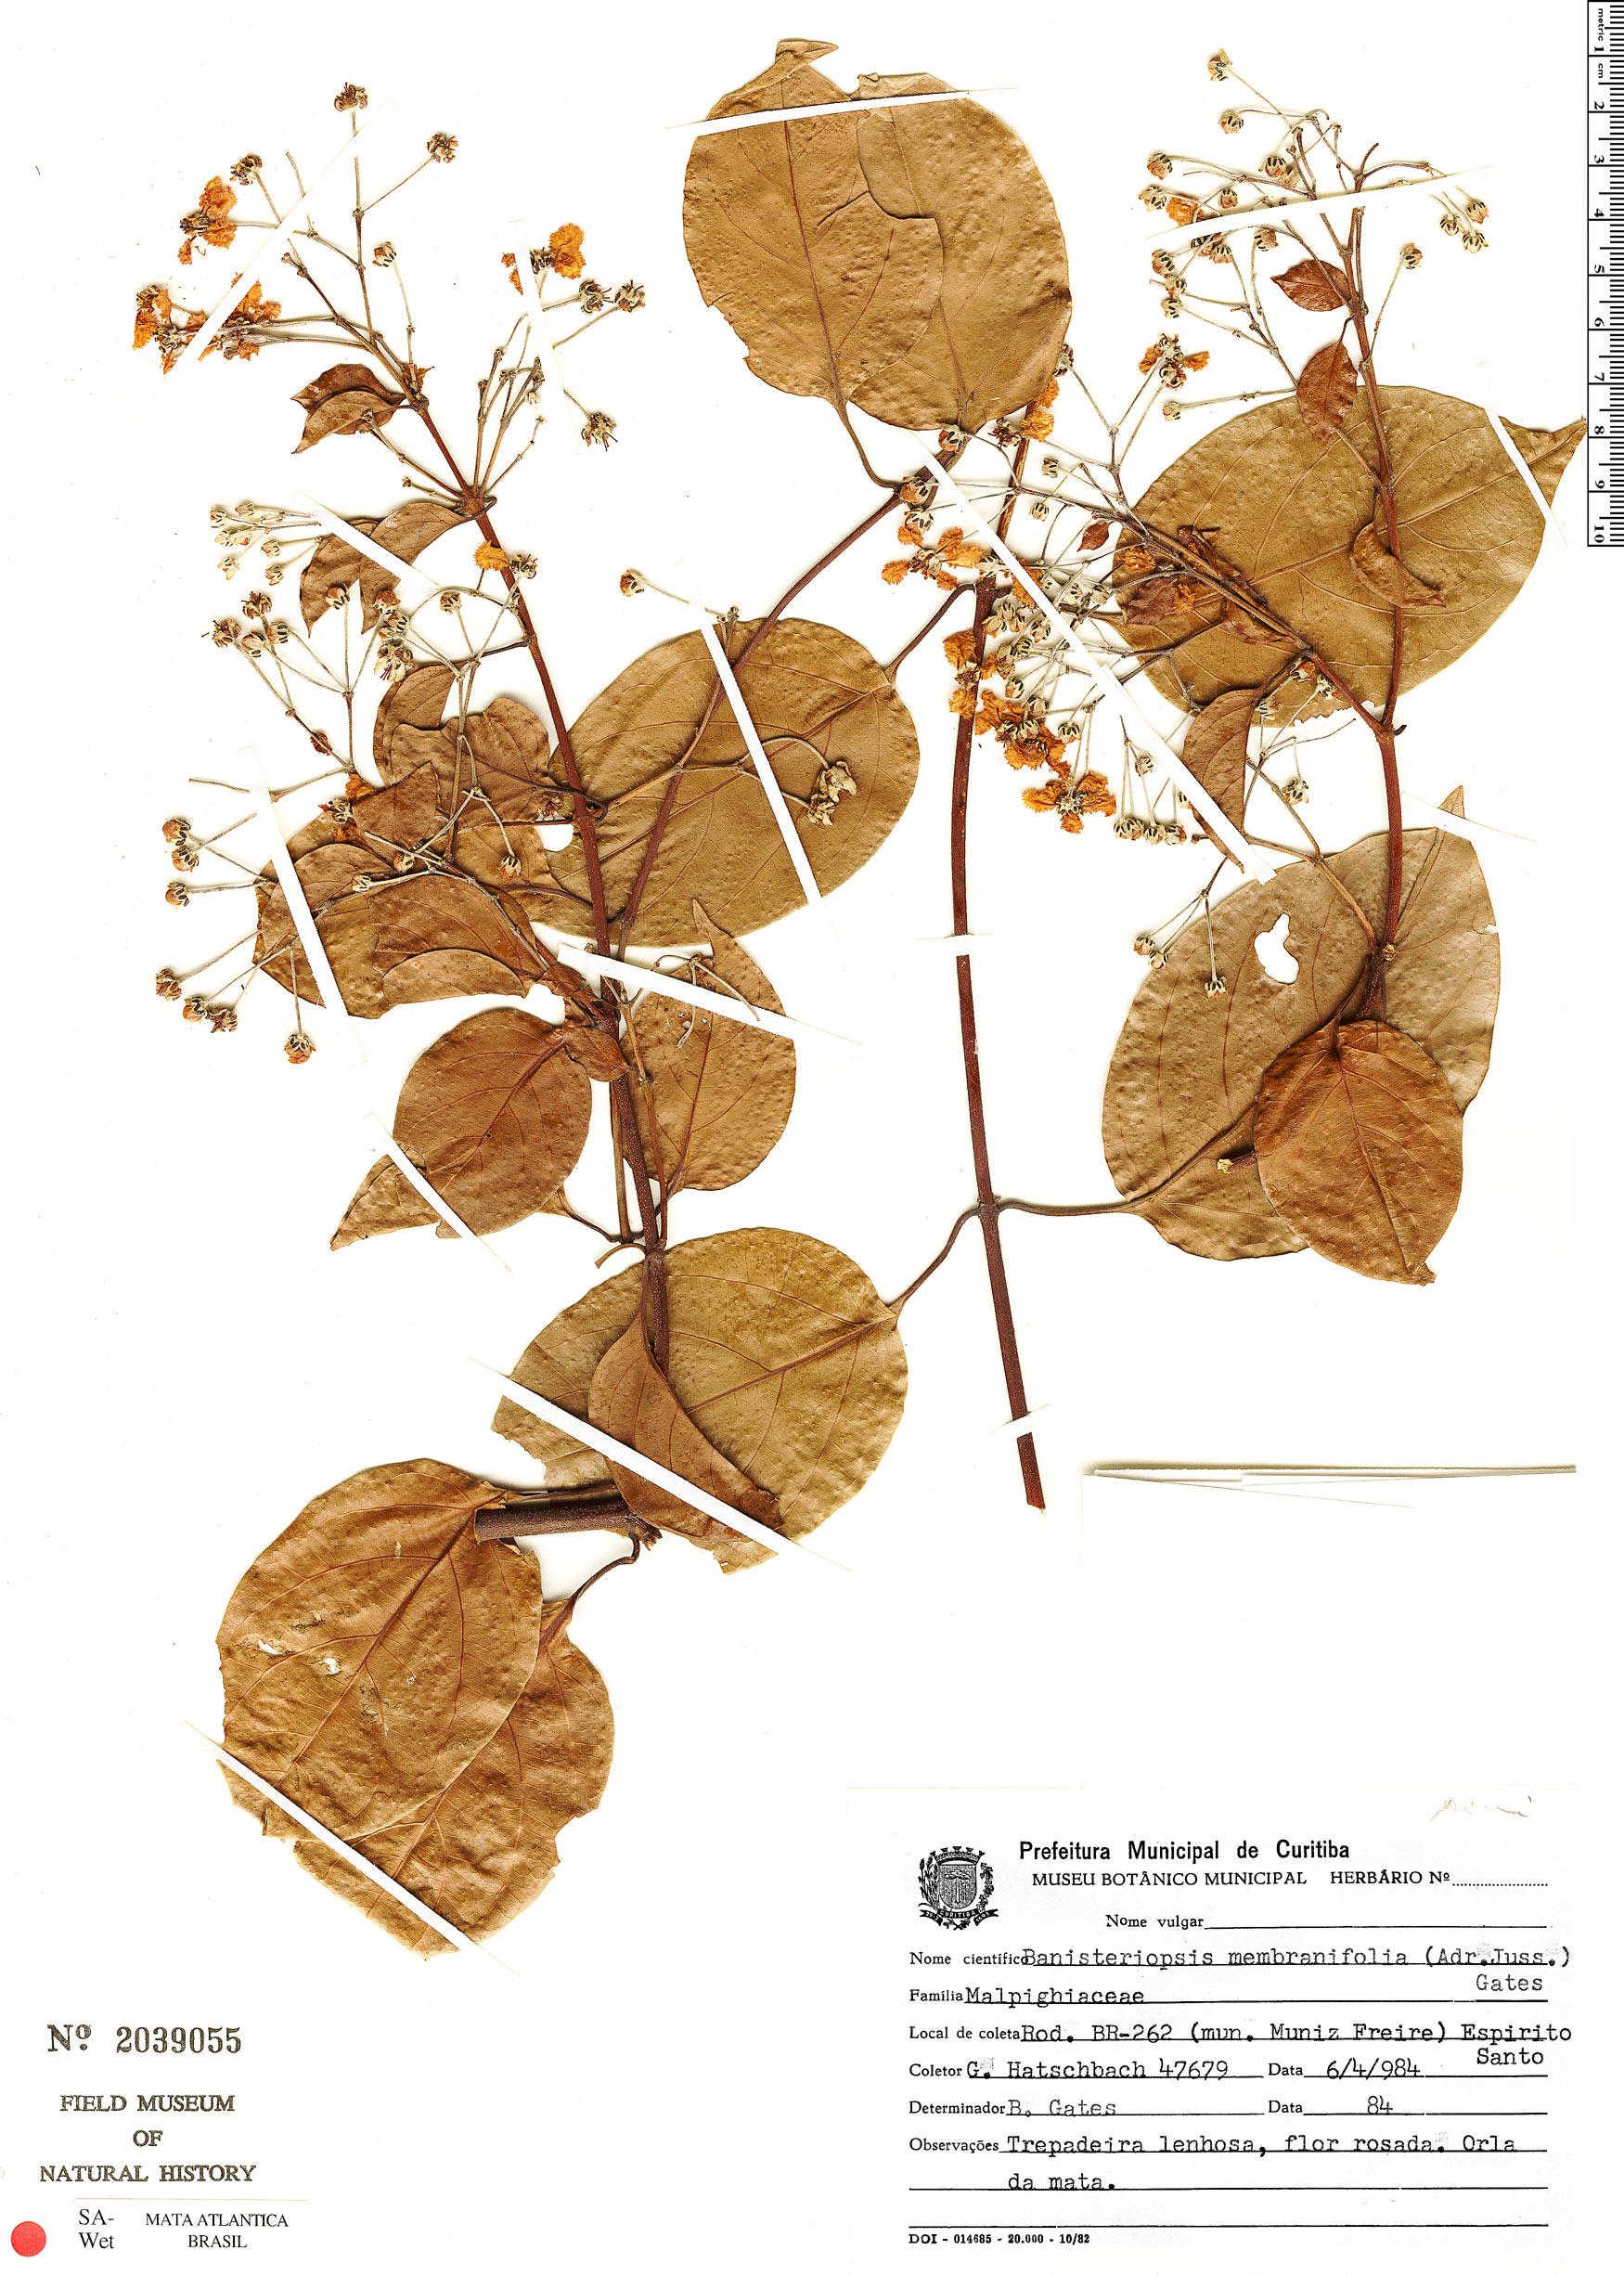 Specimen: Banisteriopsis membranifolia